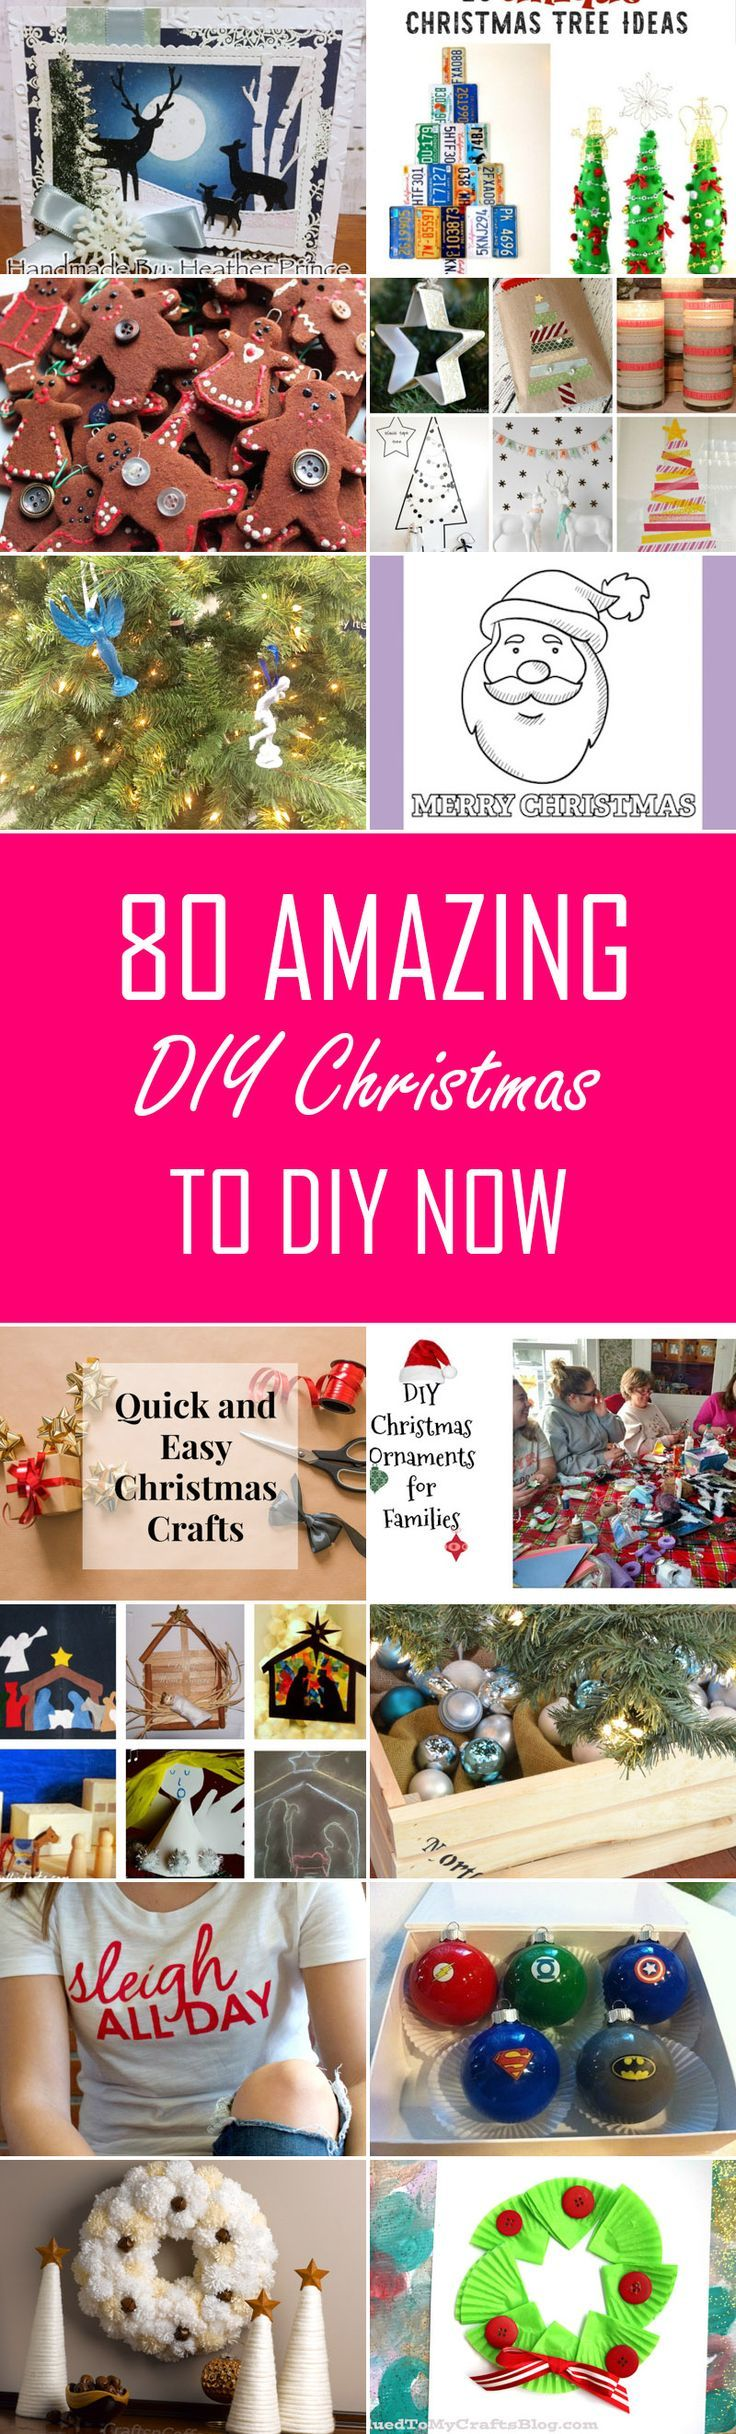 80 Amazing DIY Christmas To DIY Now